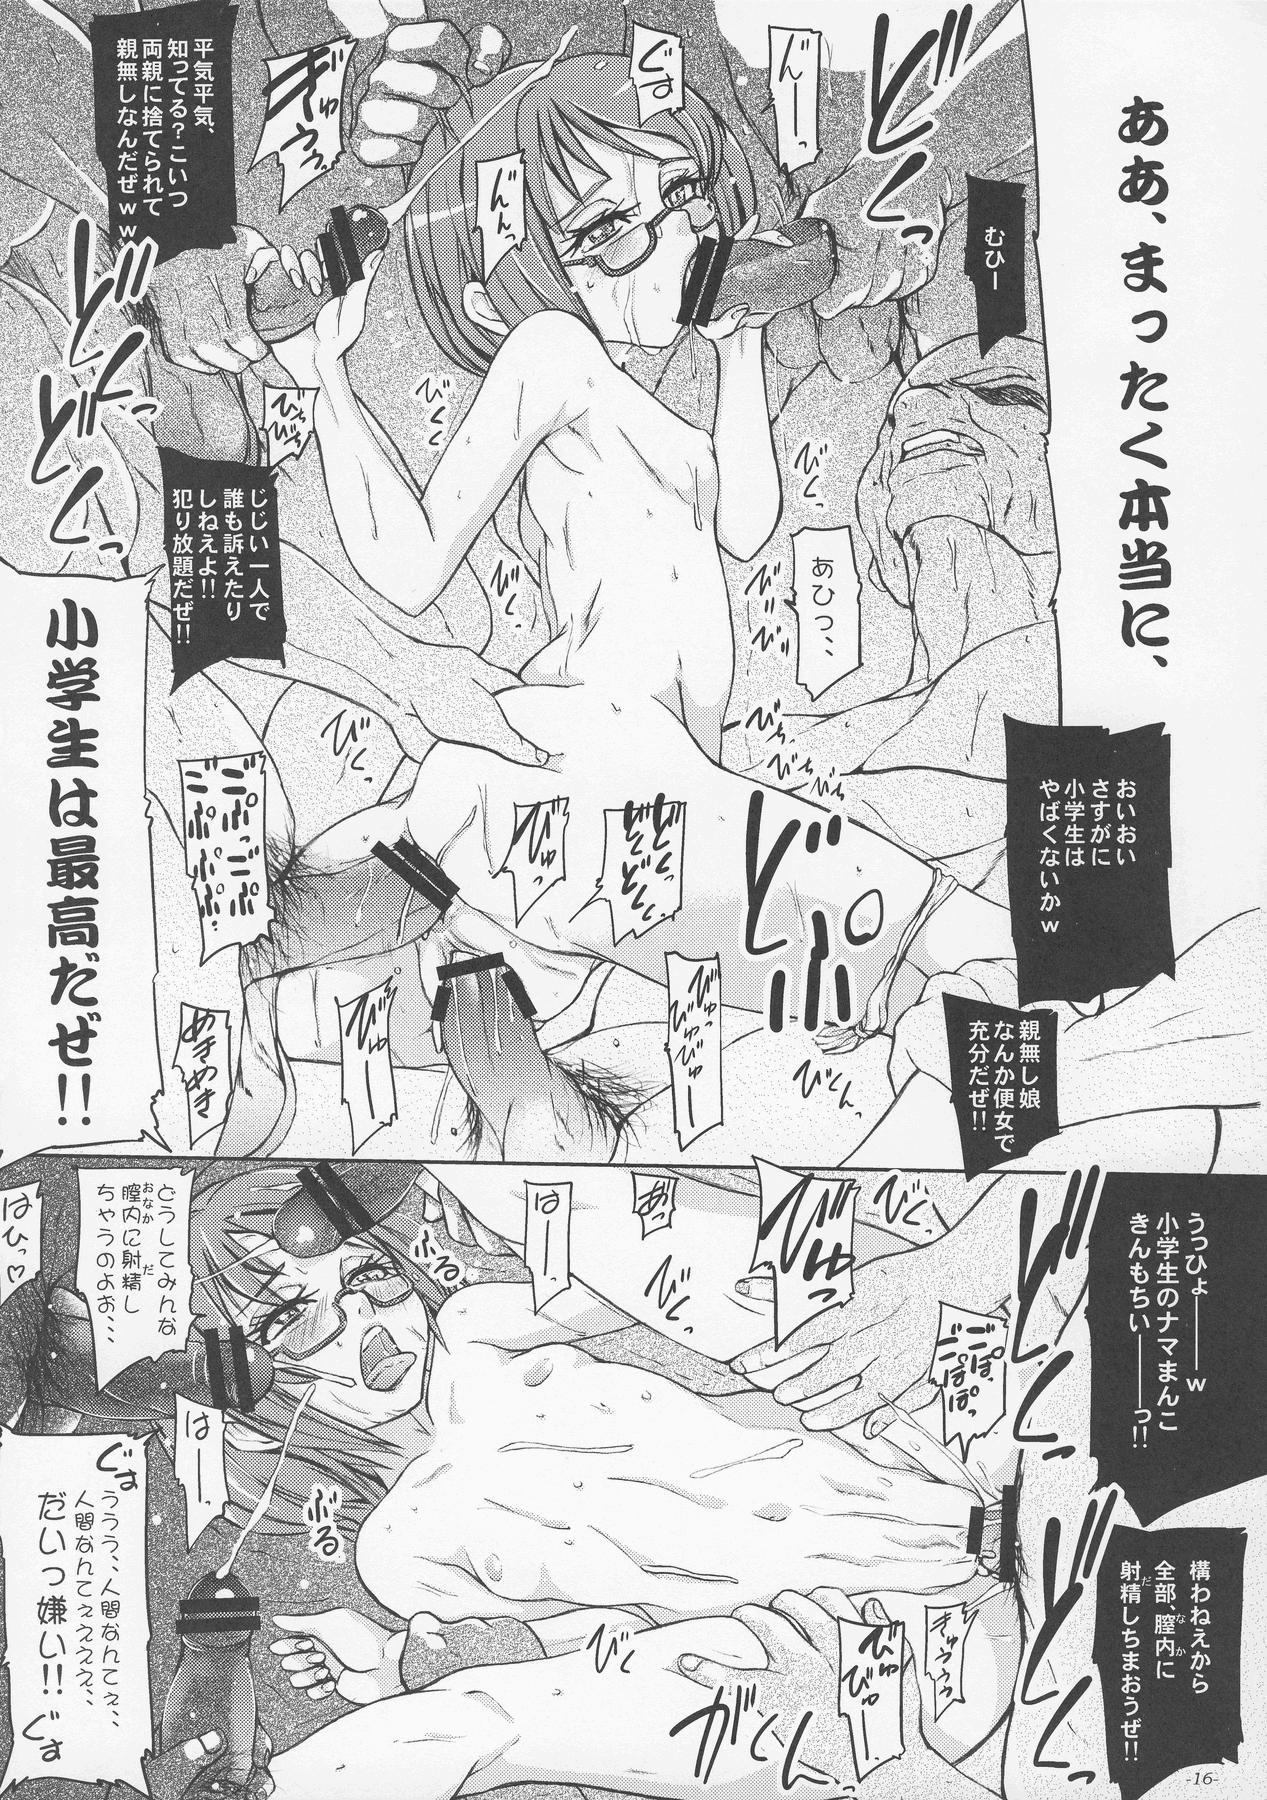 Kocchi wo Muiteyo, Ako-chan! 16